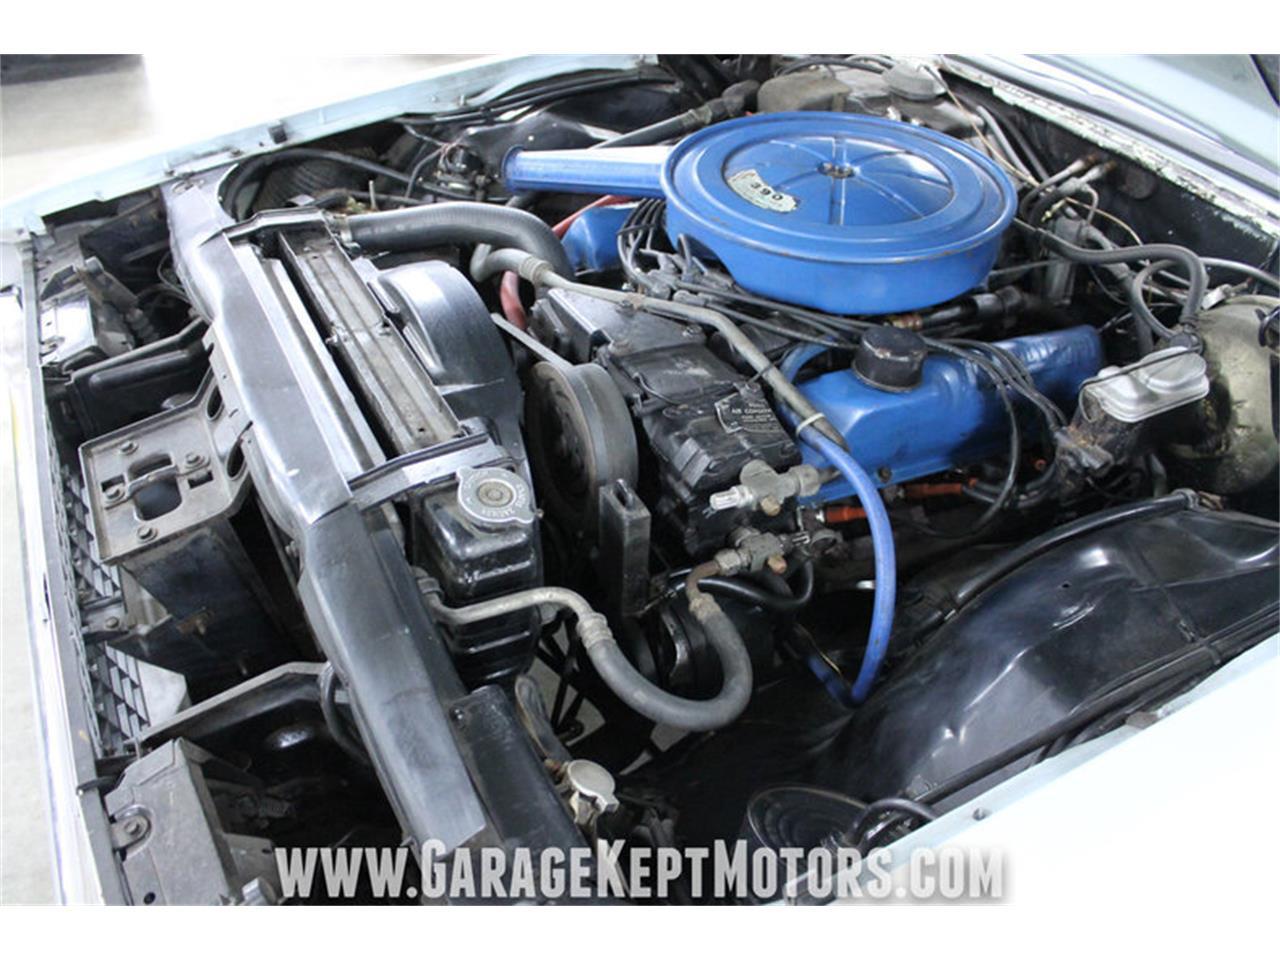 Large Picture of Classic '67 Thunderbird 2-Door Landau - $11,900.00 Offered by Garage Kept Motors - LU7P